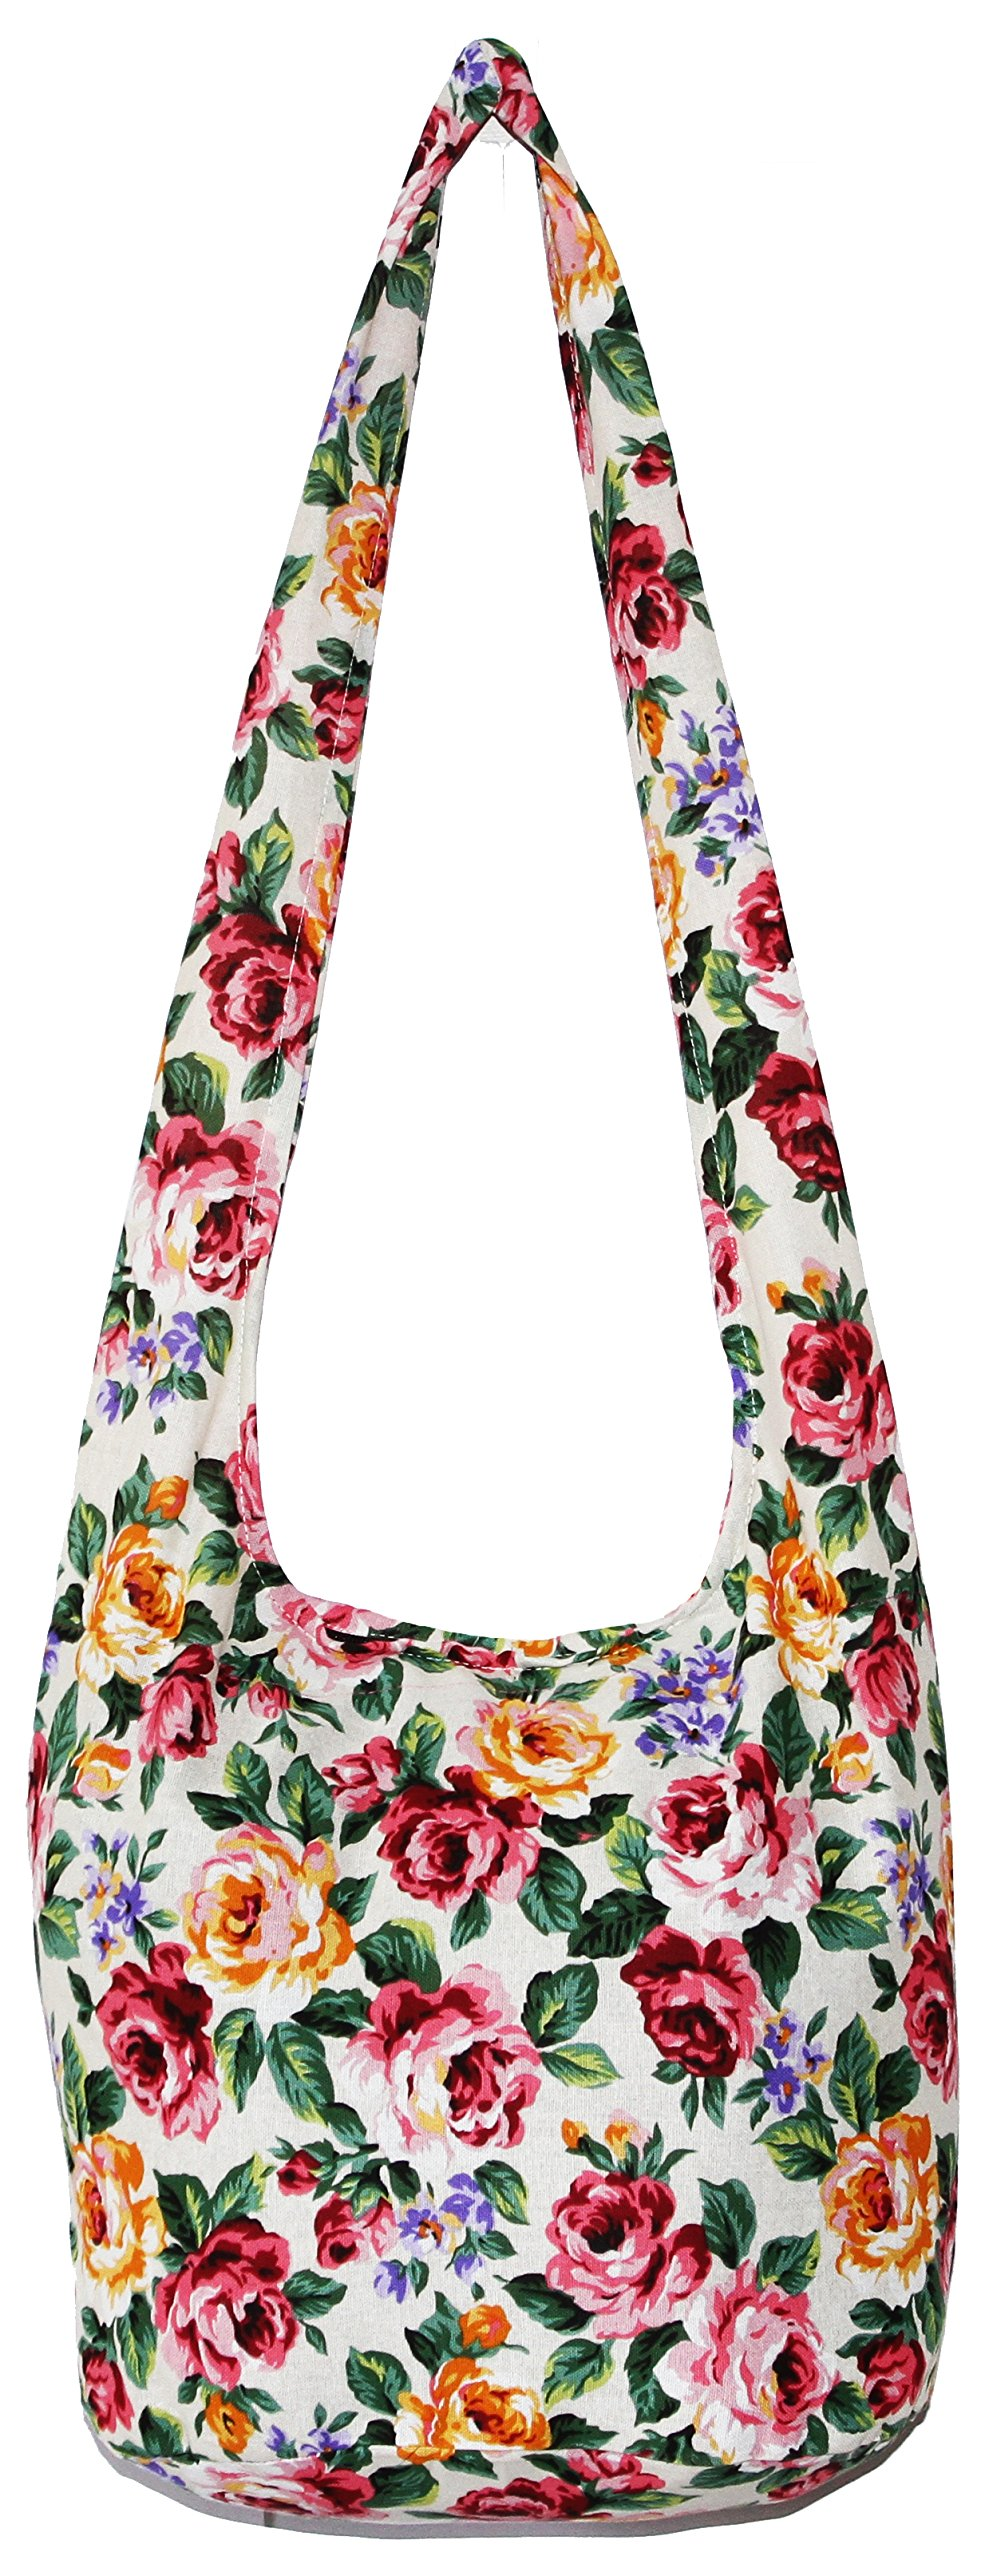 Rose Bohemian Hobo Boho Hippie Hipster Crossbody Bag Purse 35 Inch (CreamPinkRose)